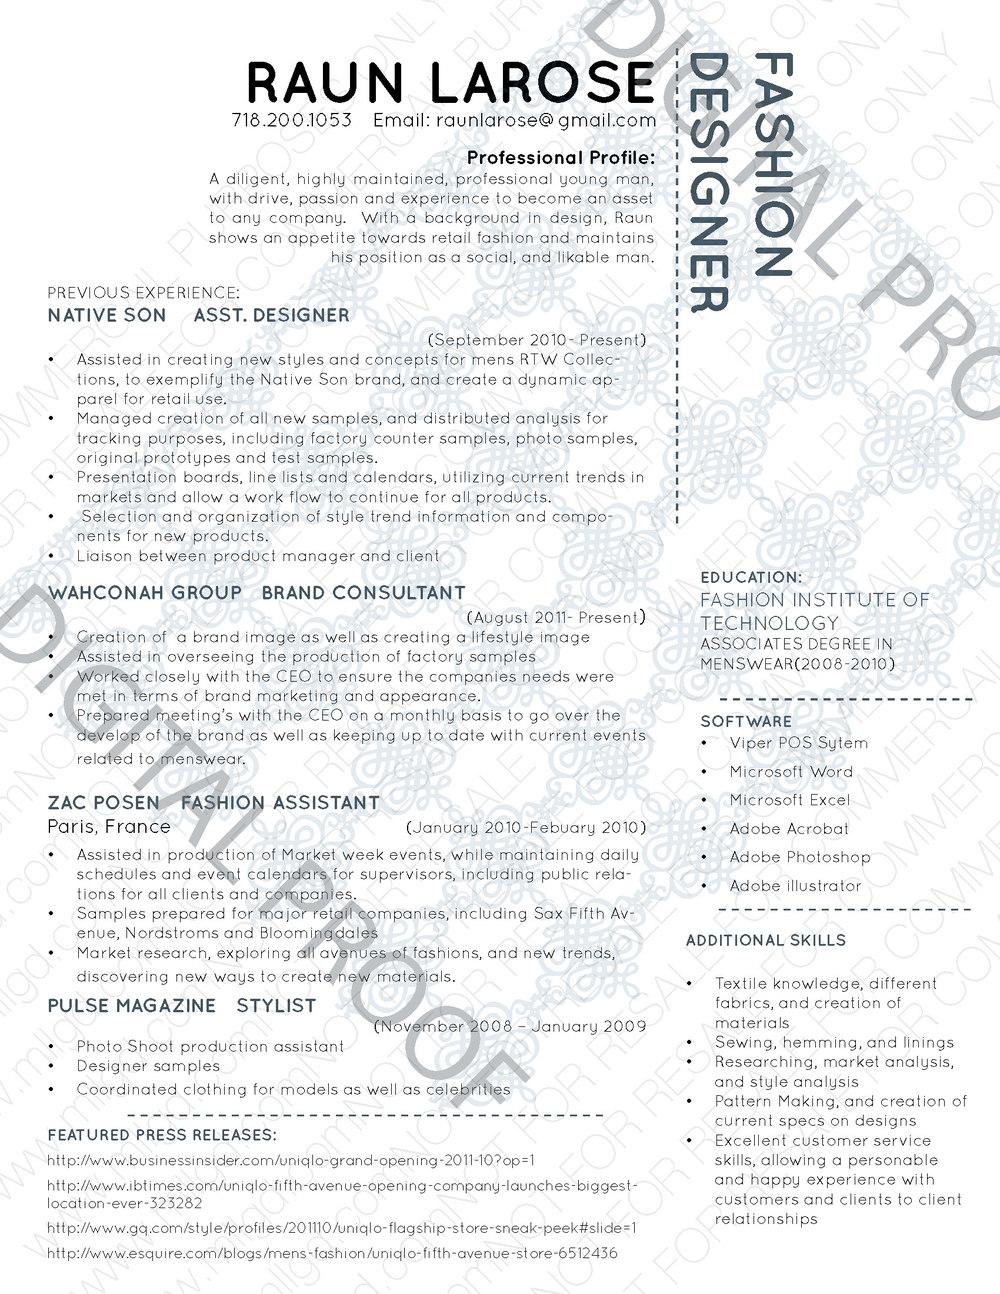 MLL_Resume_Design_2014_Page_27.jpg